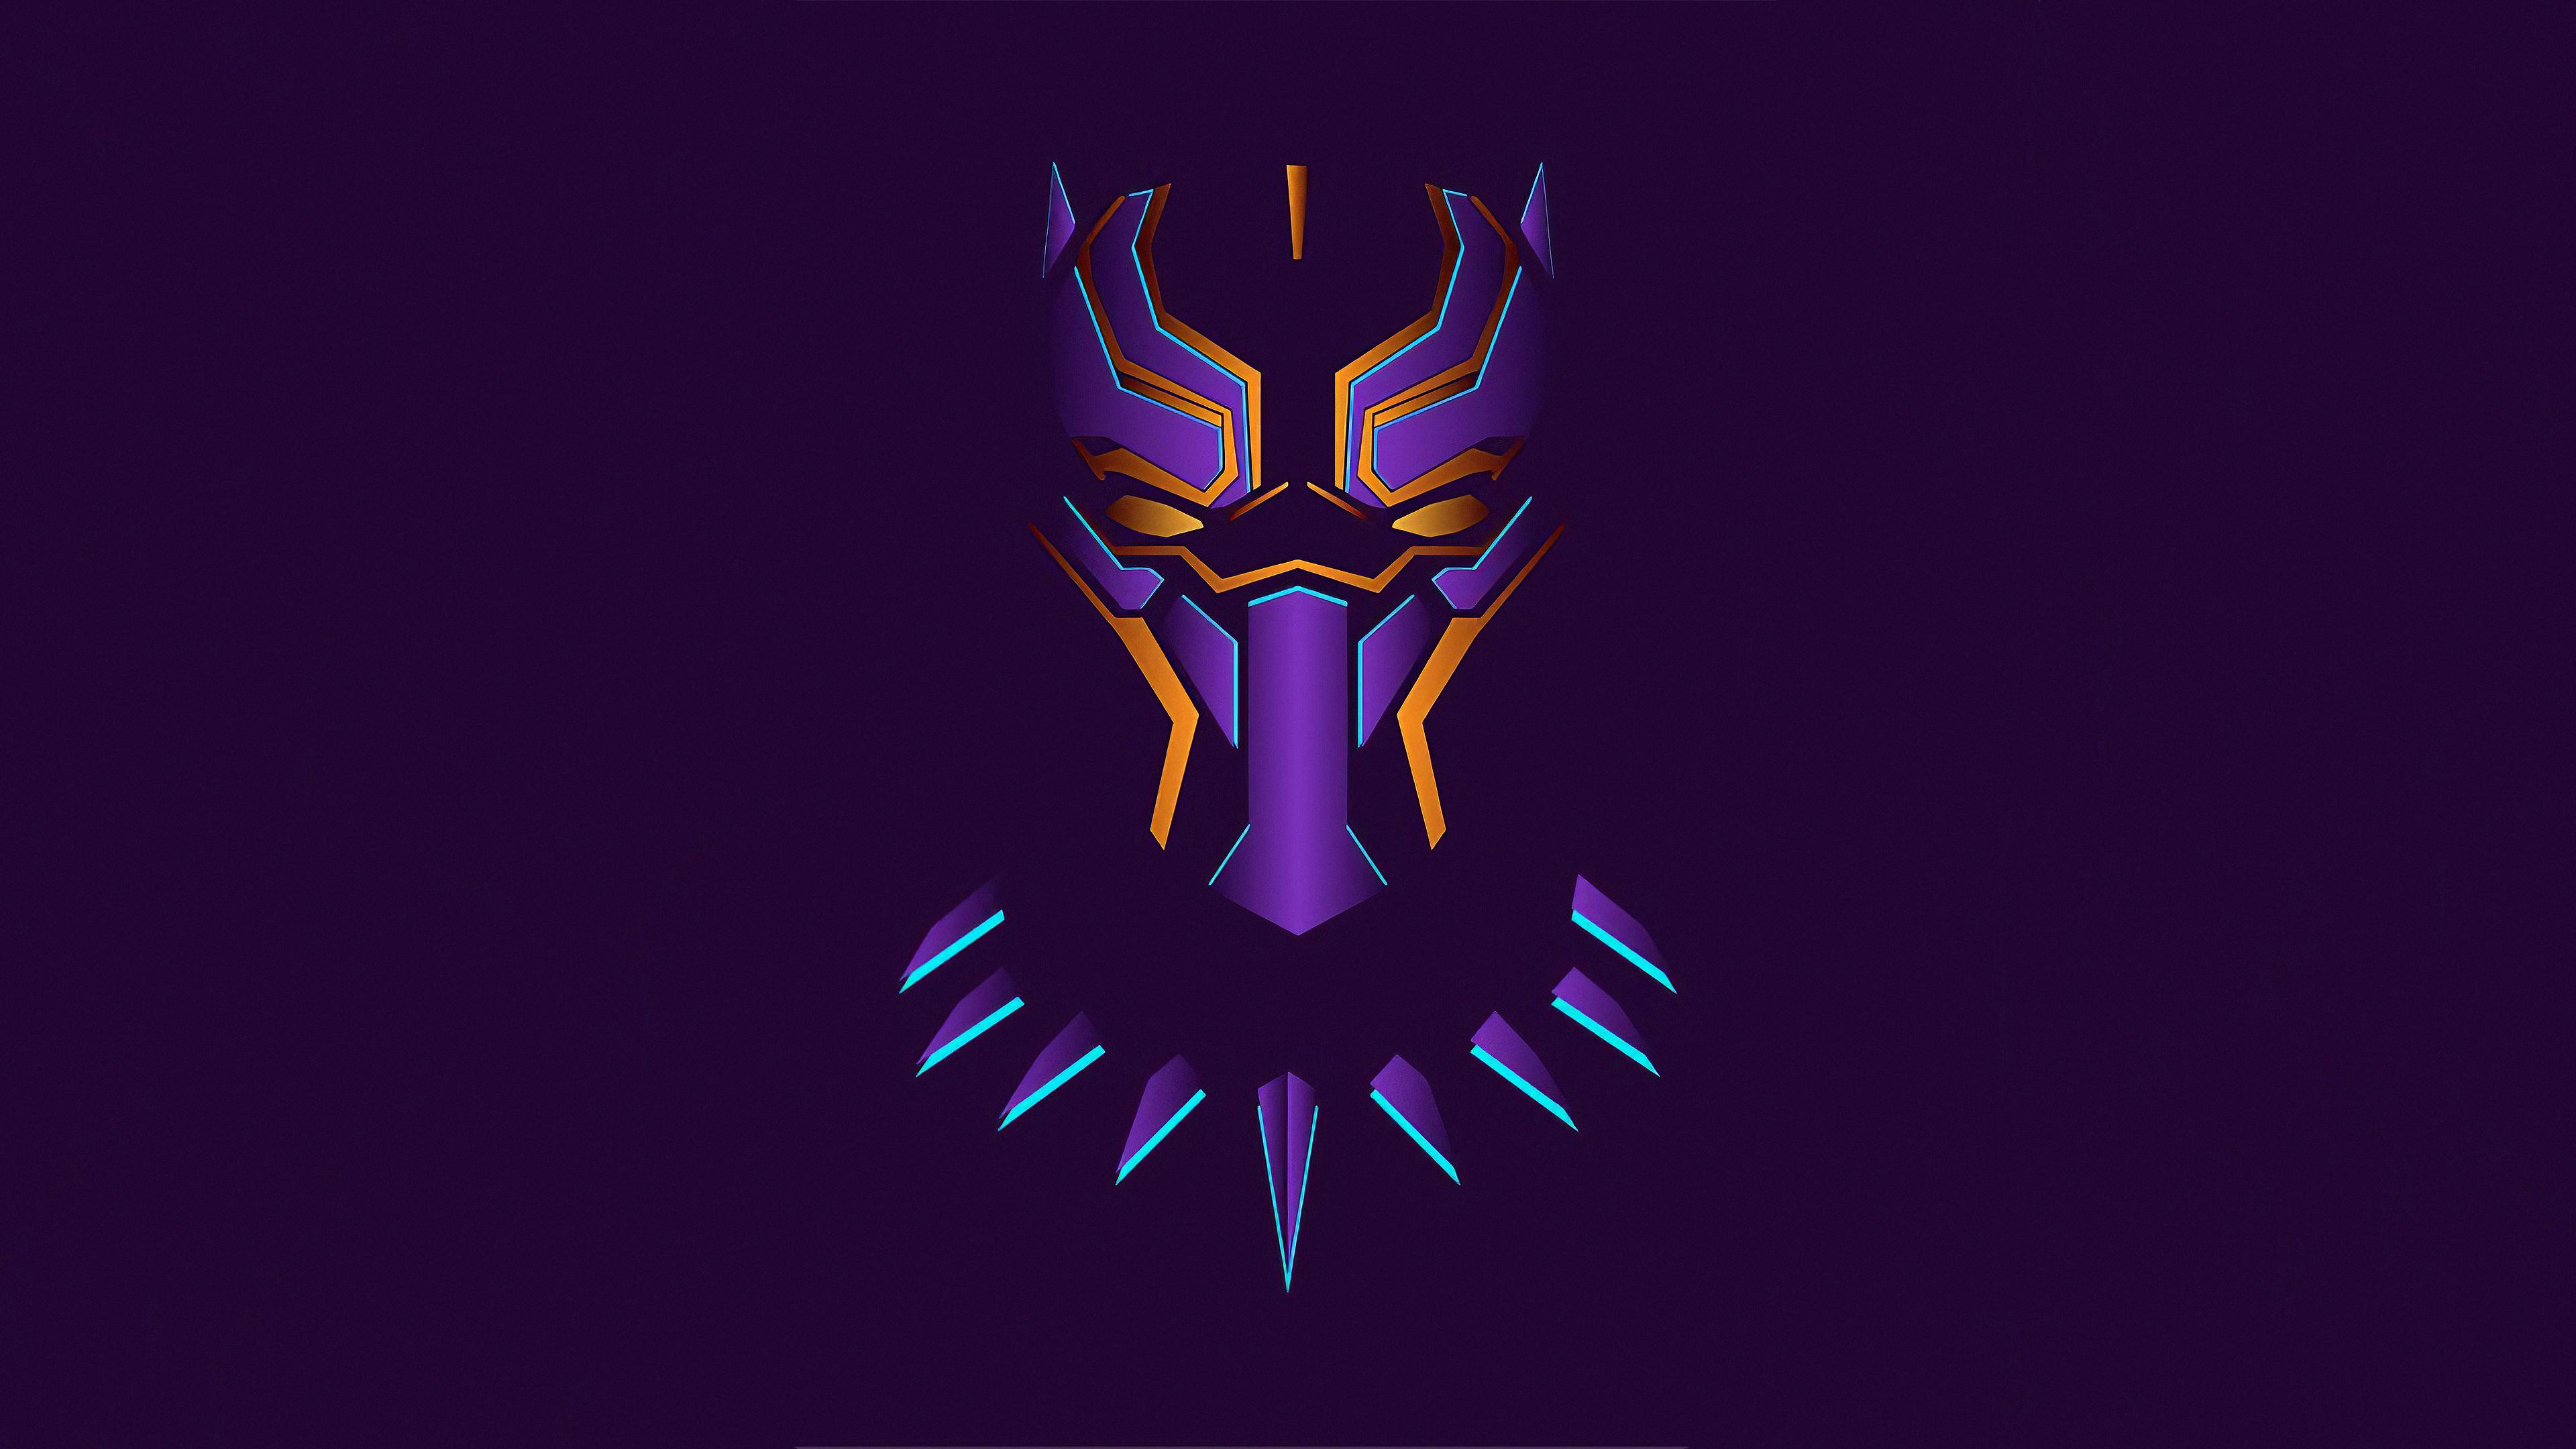 Hd Wallpaper Black Panther 3840x2160 Download Hd Wallpaper Wallpapertip